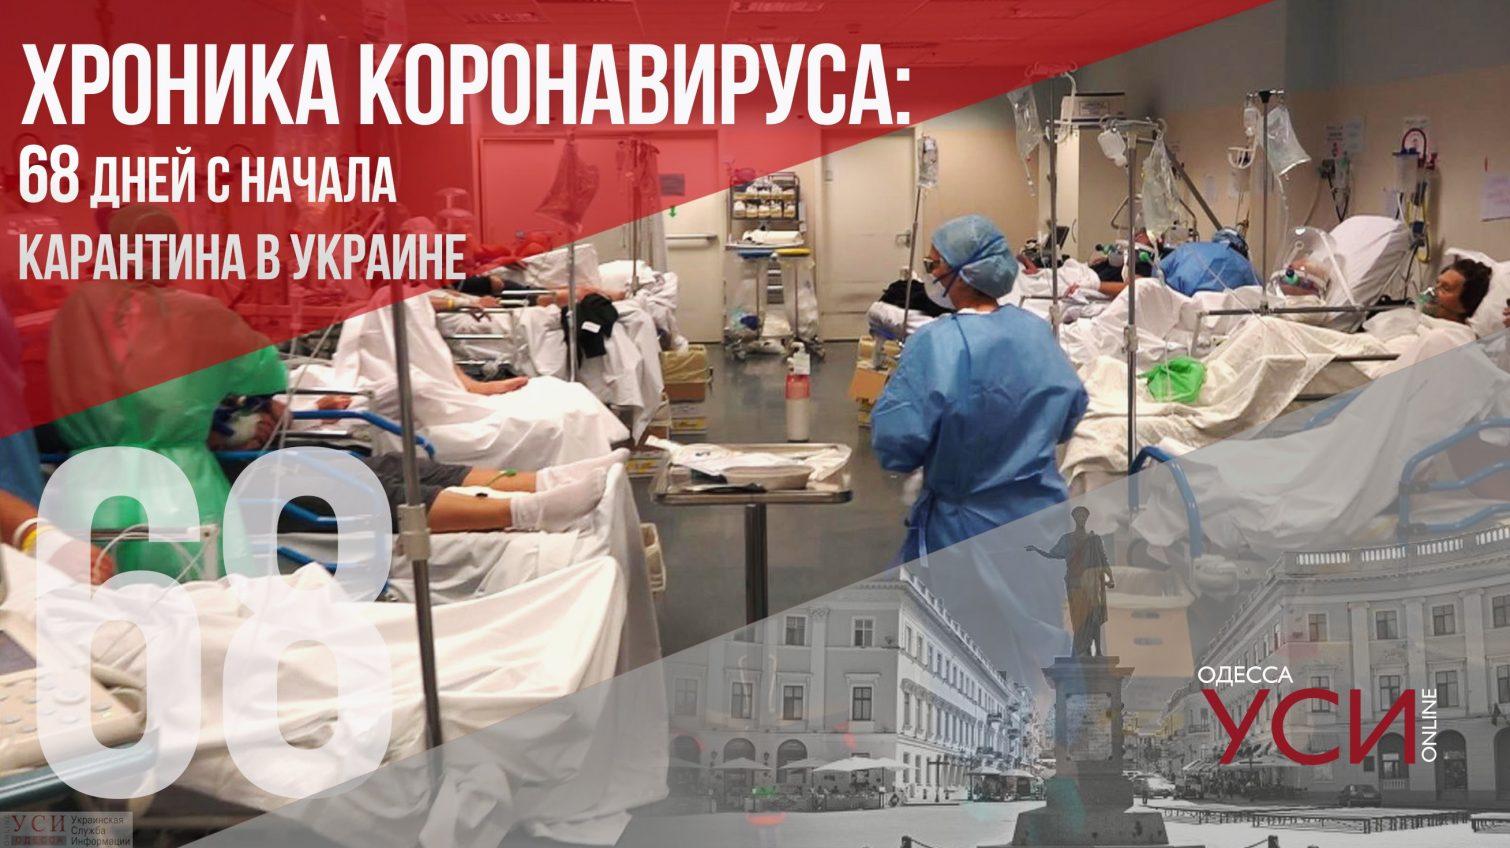 Хроника коронавируса: 68 дней с начала карантина в Украине ОБНОВЛЯЕТСЯ «фото»